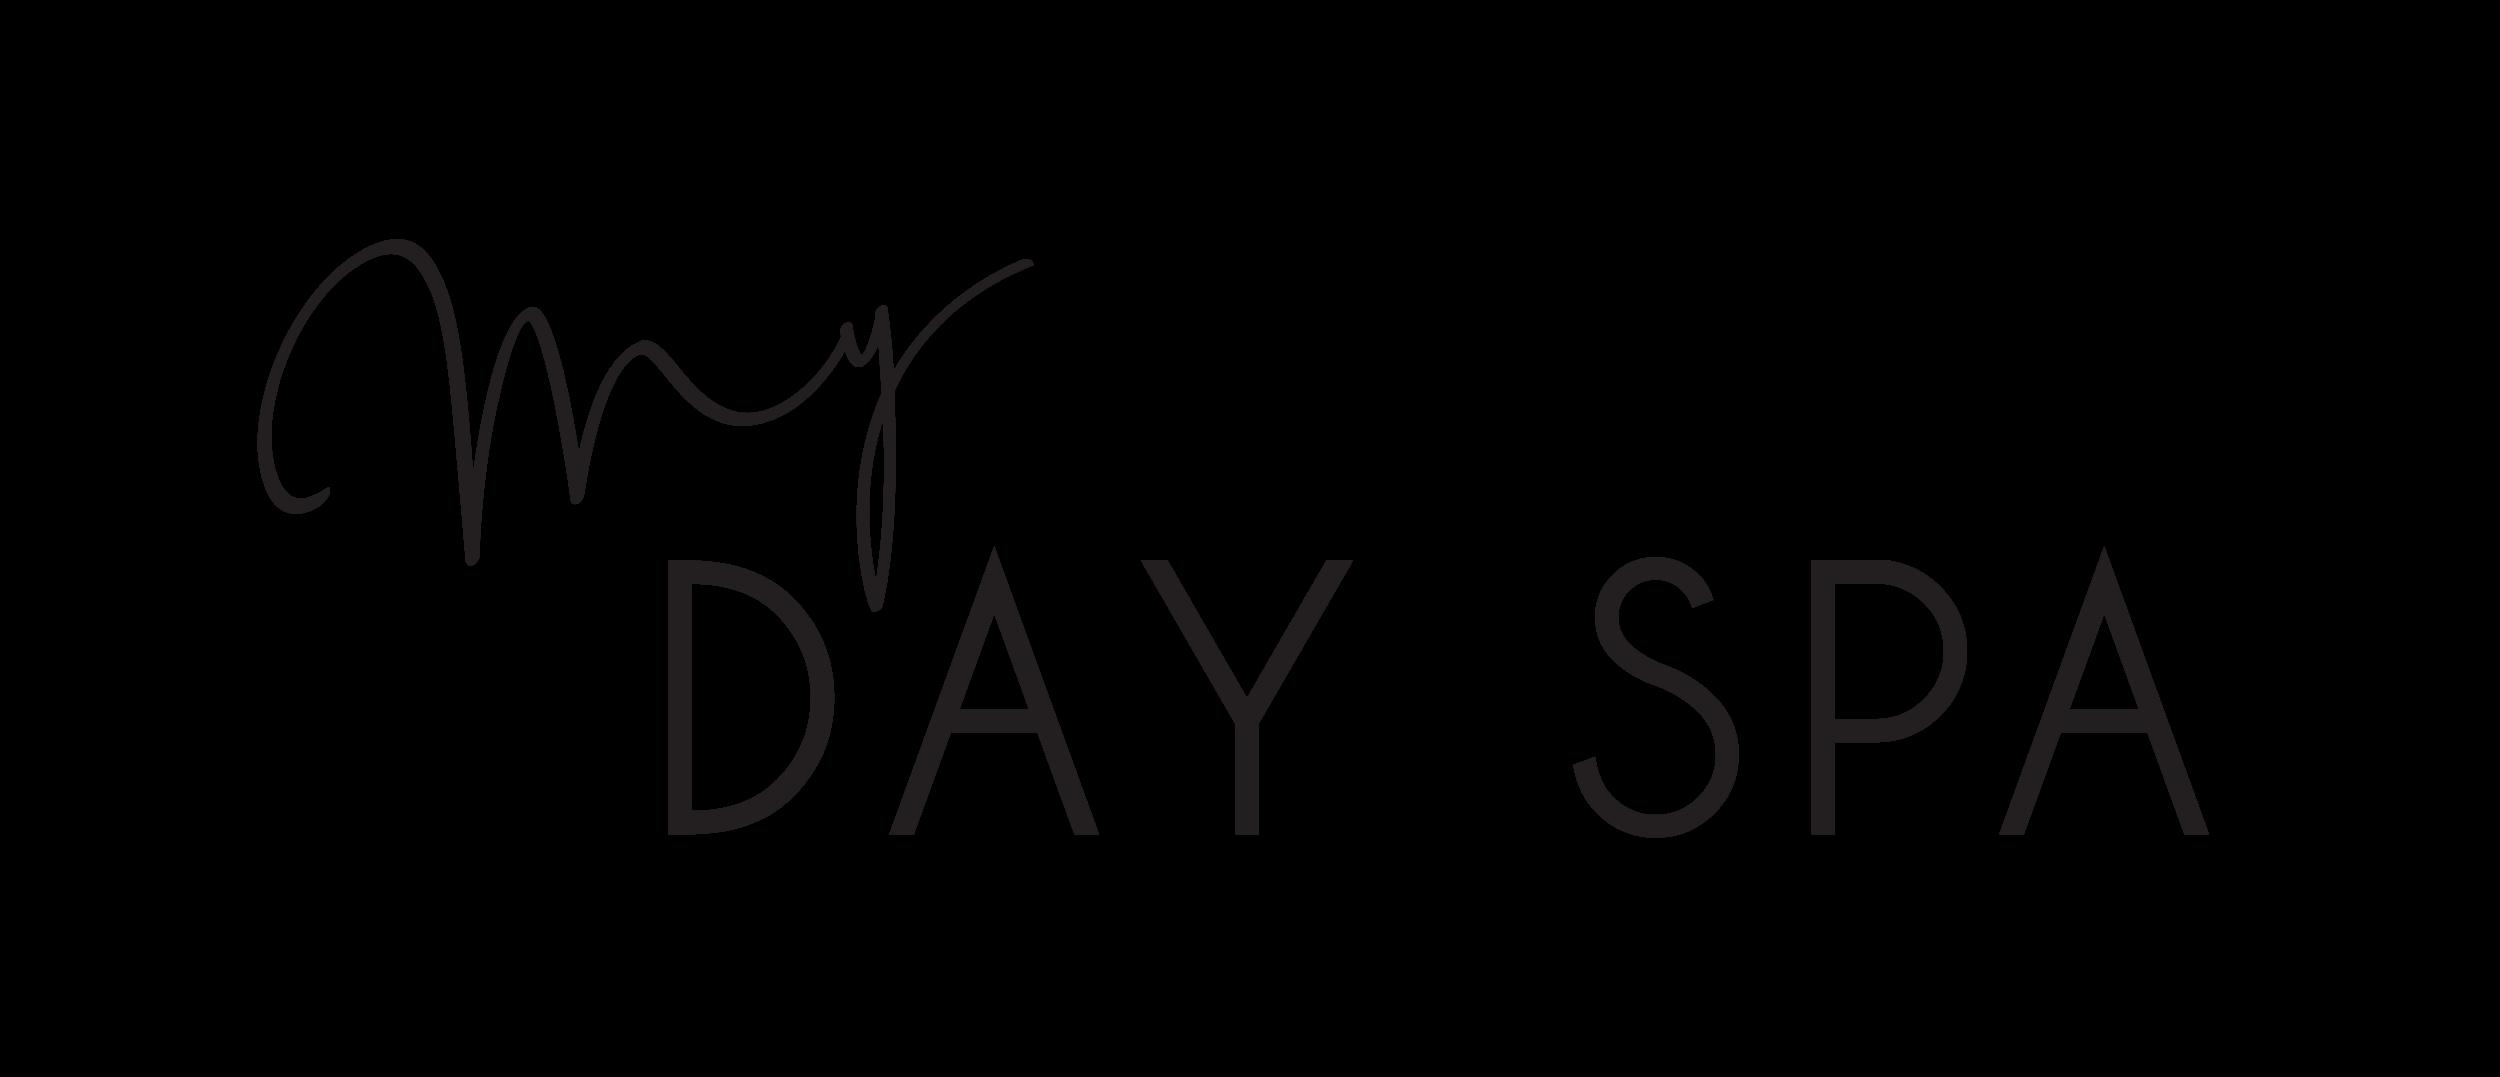 MyDaySpa_Logo_Black.png